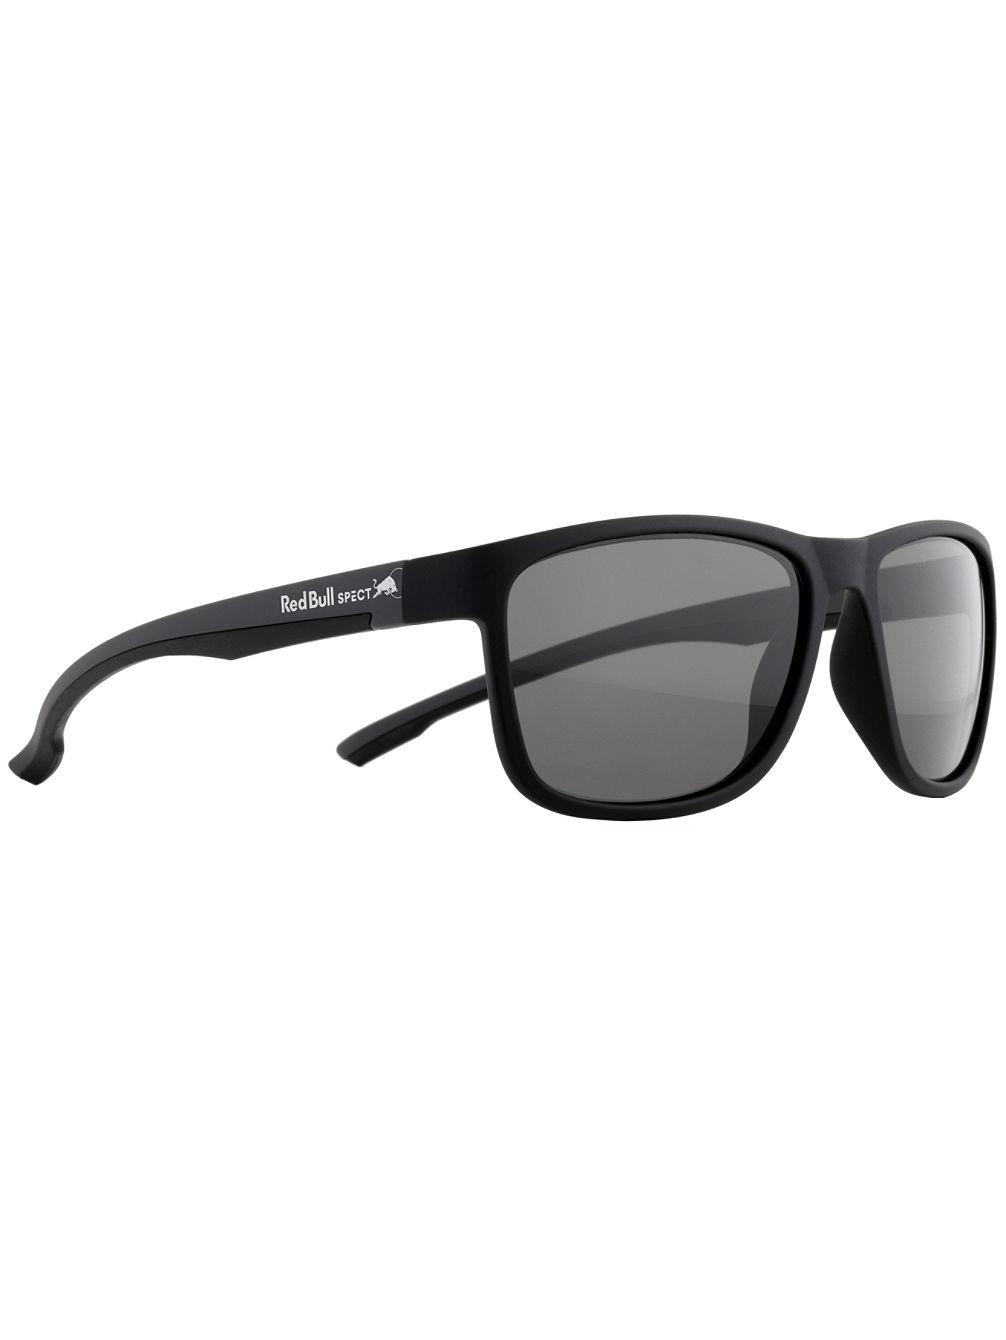 7491a22a64 Buy Red Bull SPECT Sunglasses Twist Matte Black Matte Grey Temple ...